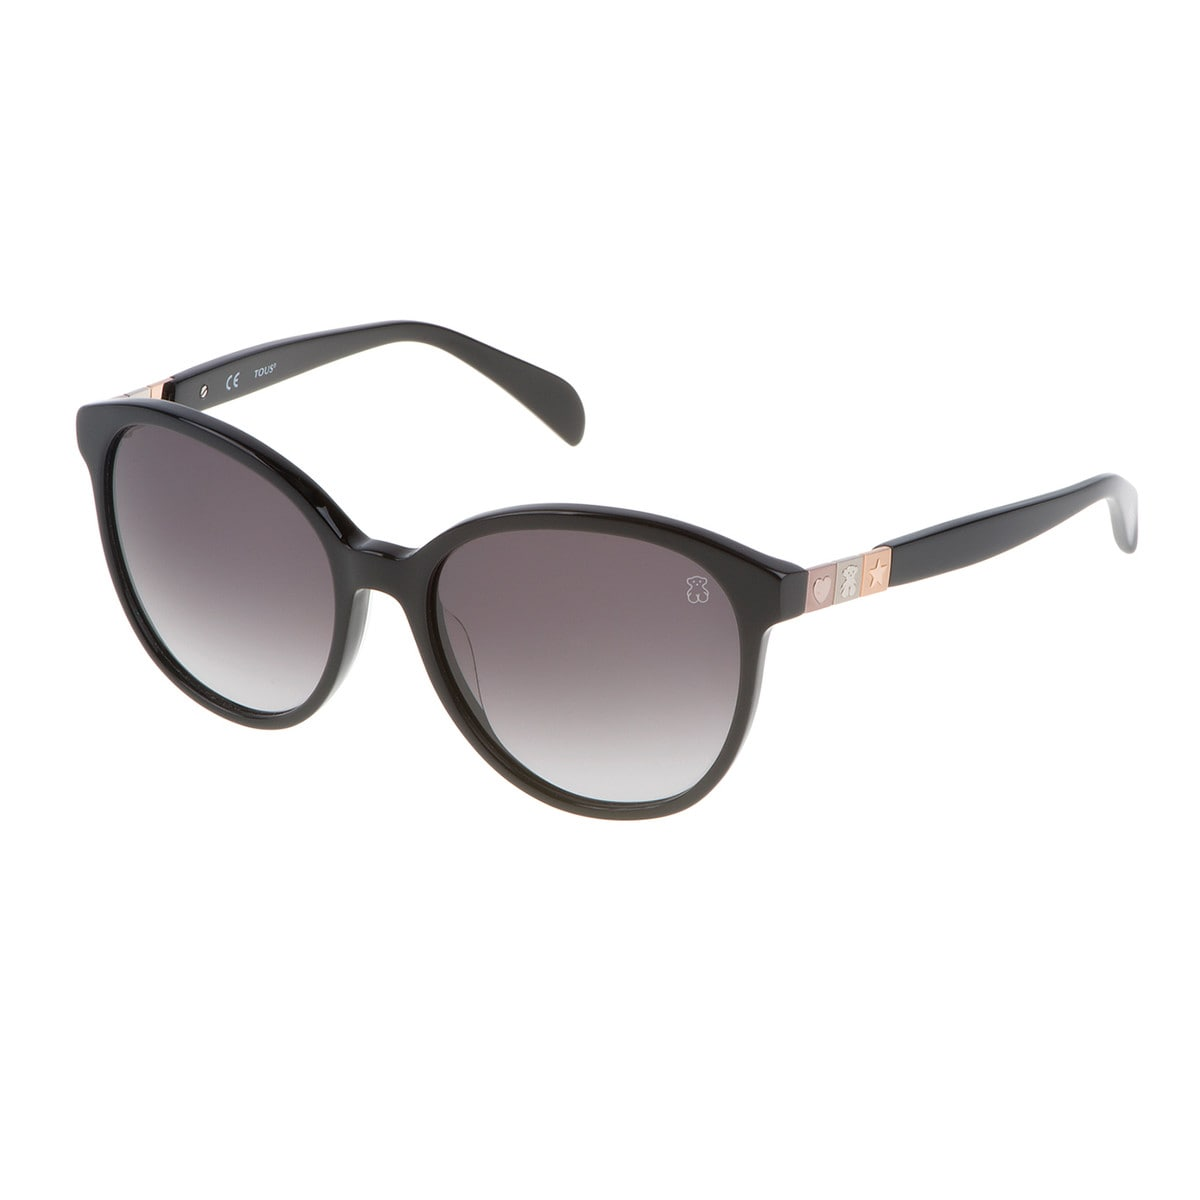 f2fcbe81da Tille Cat Eye Sunglasses - Tous Site Puerto Rico